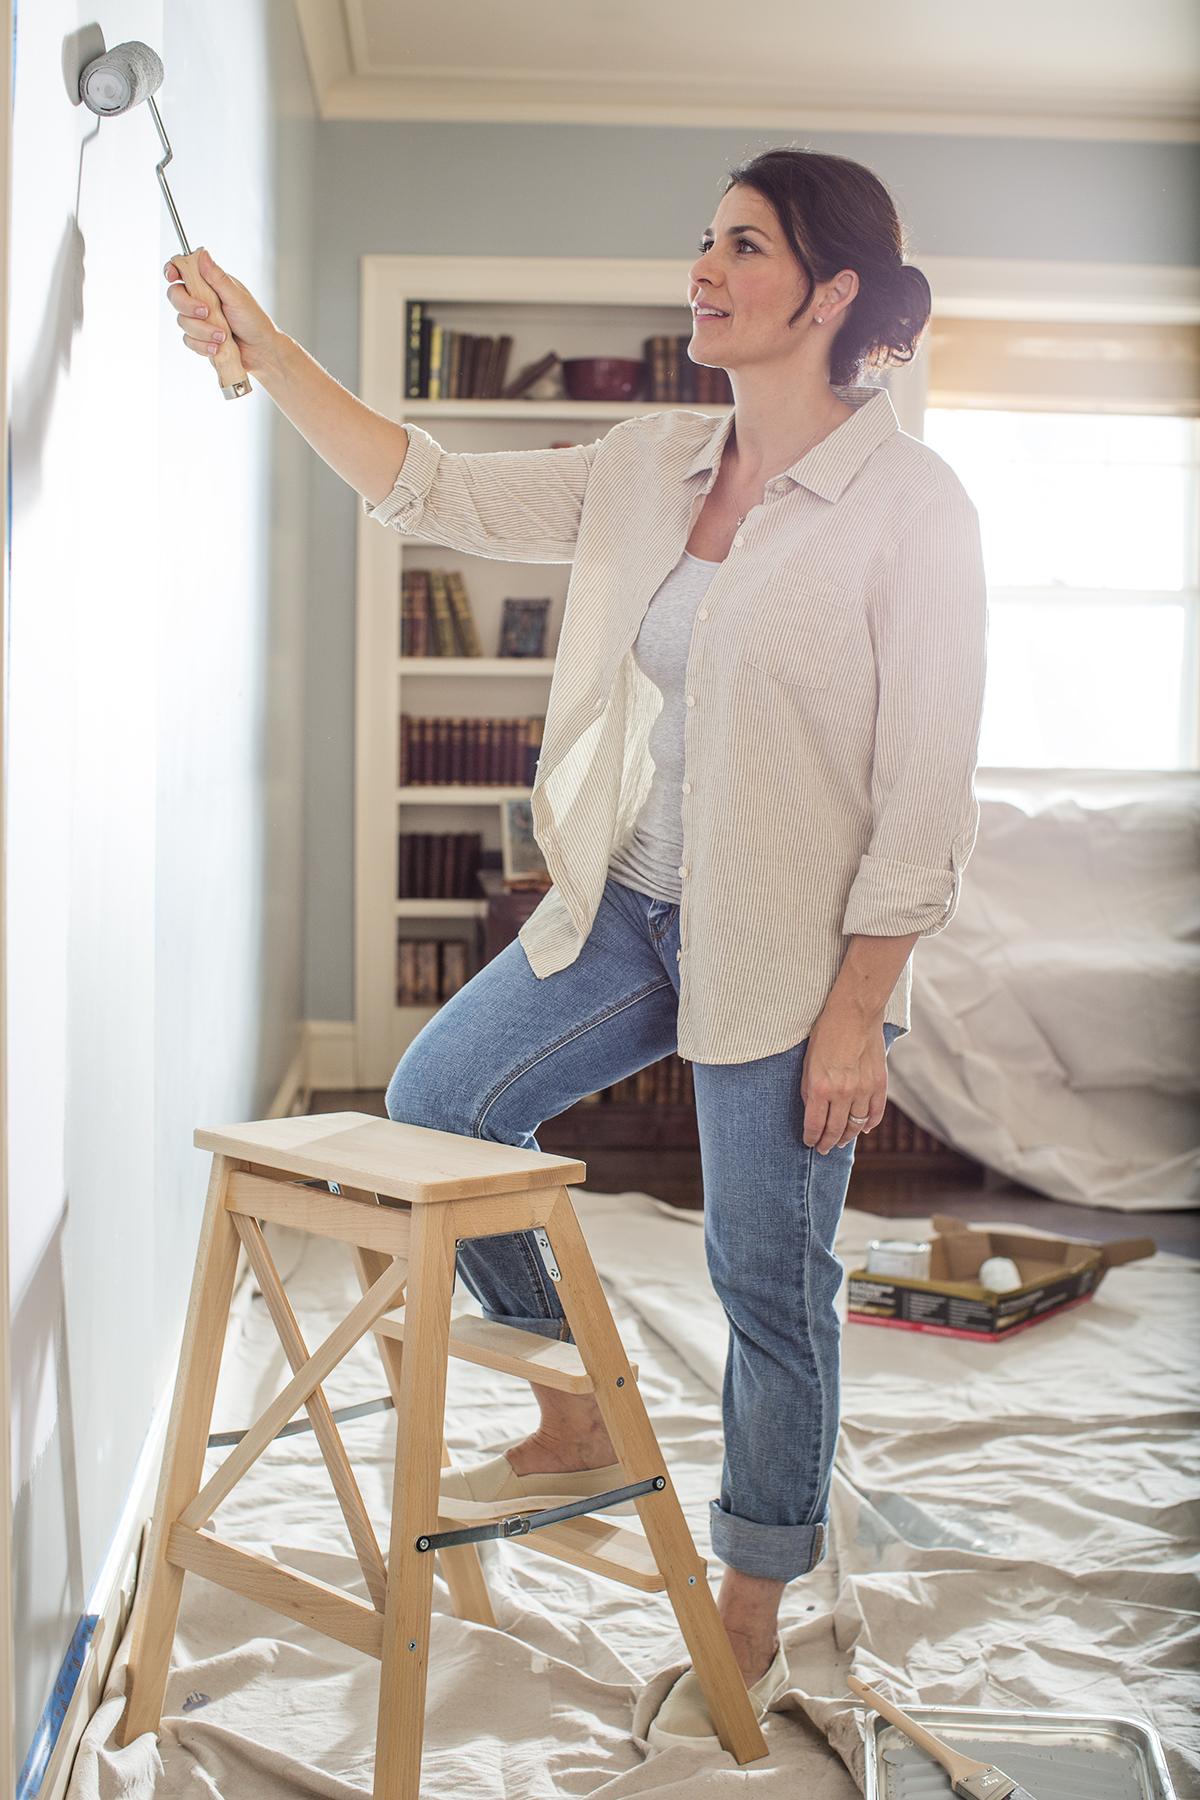 Woman-Painting-132_r1.jpg